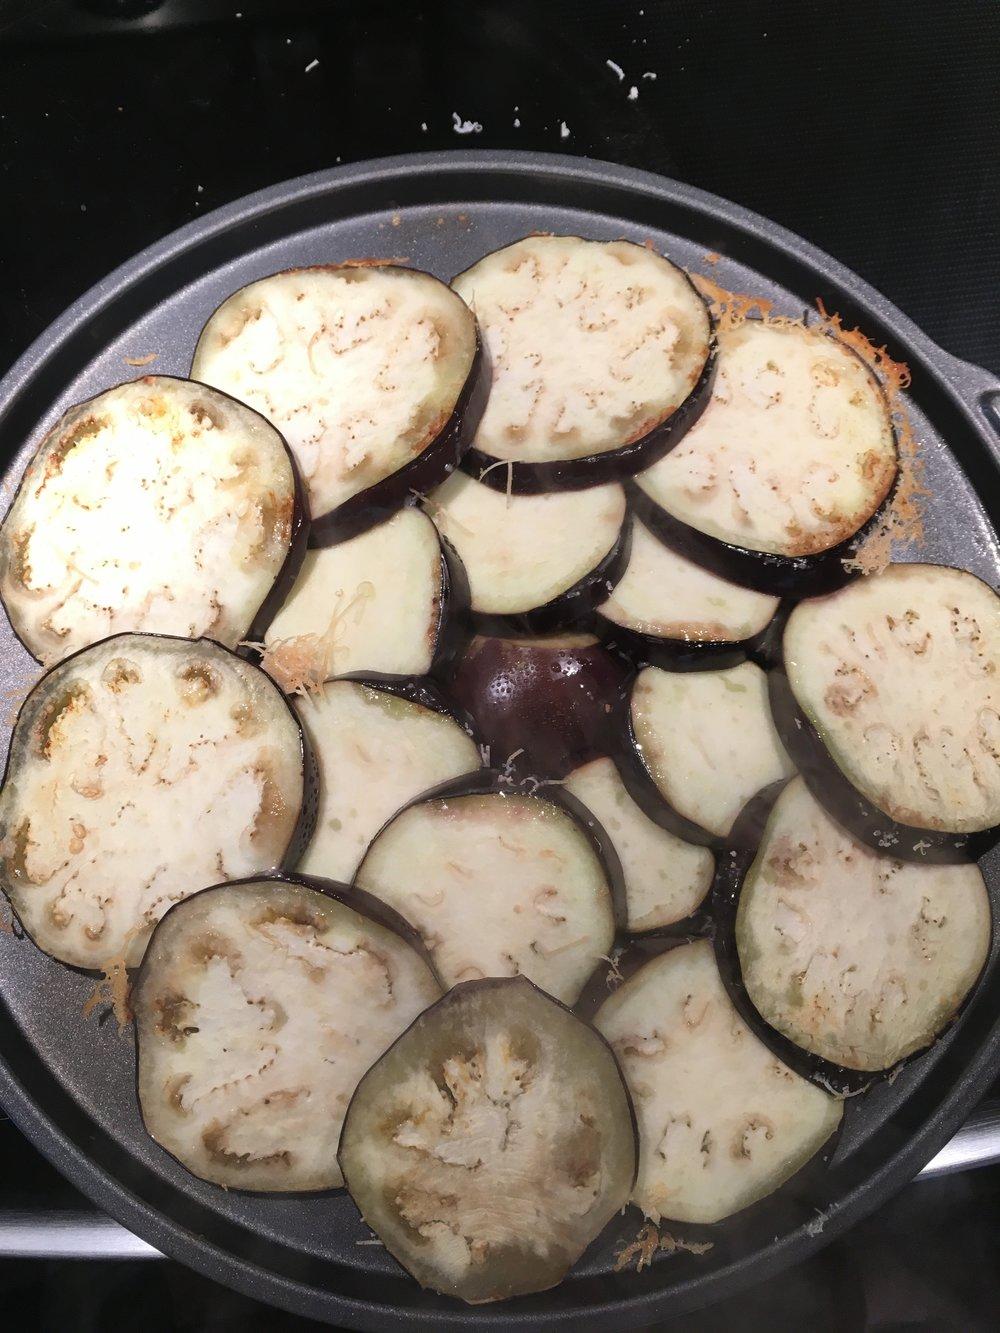 Second step, carefully flip the eggplant